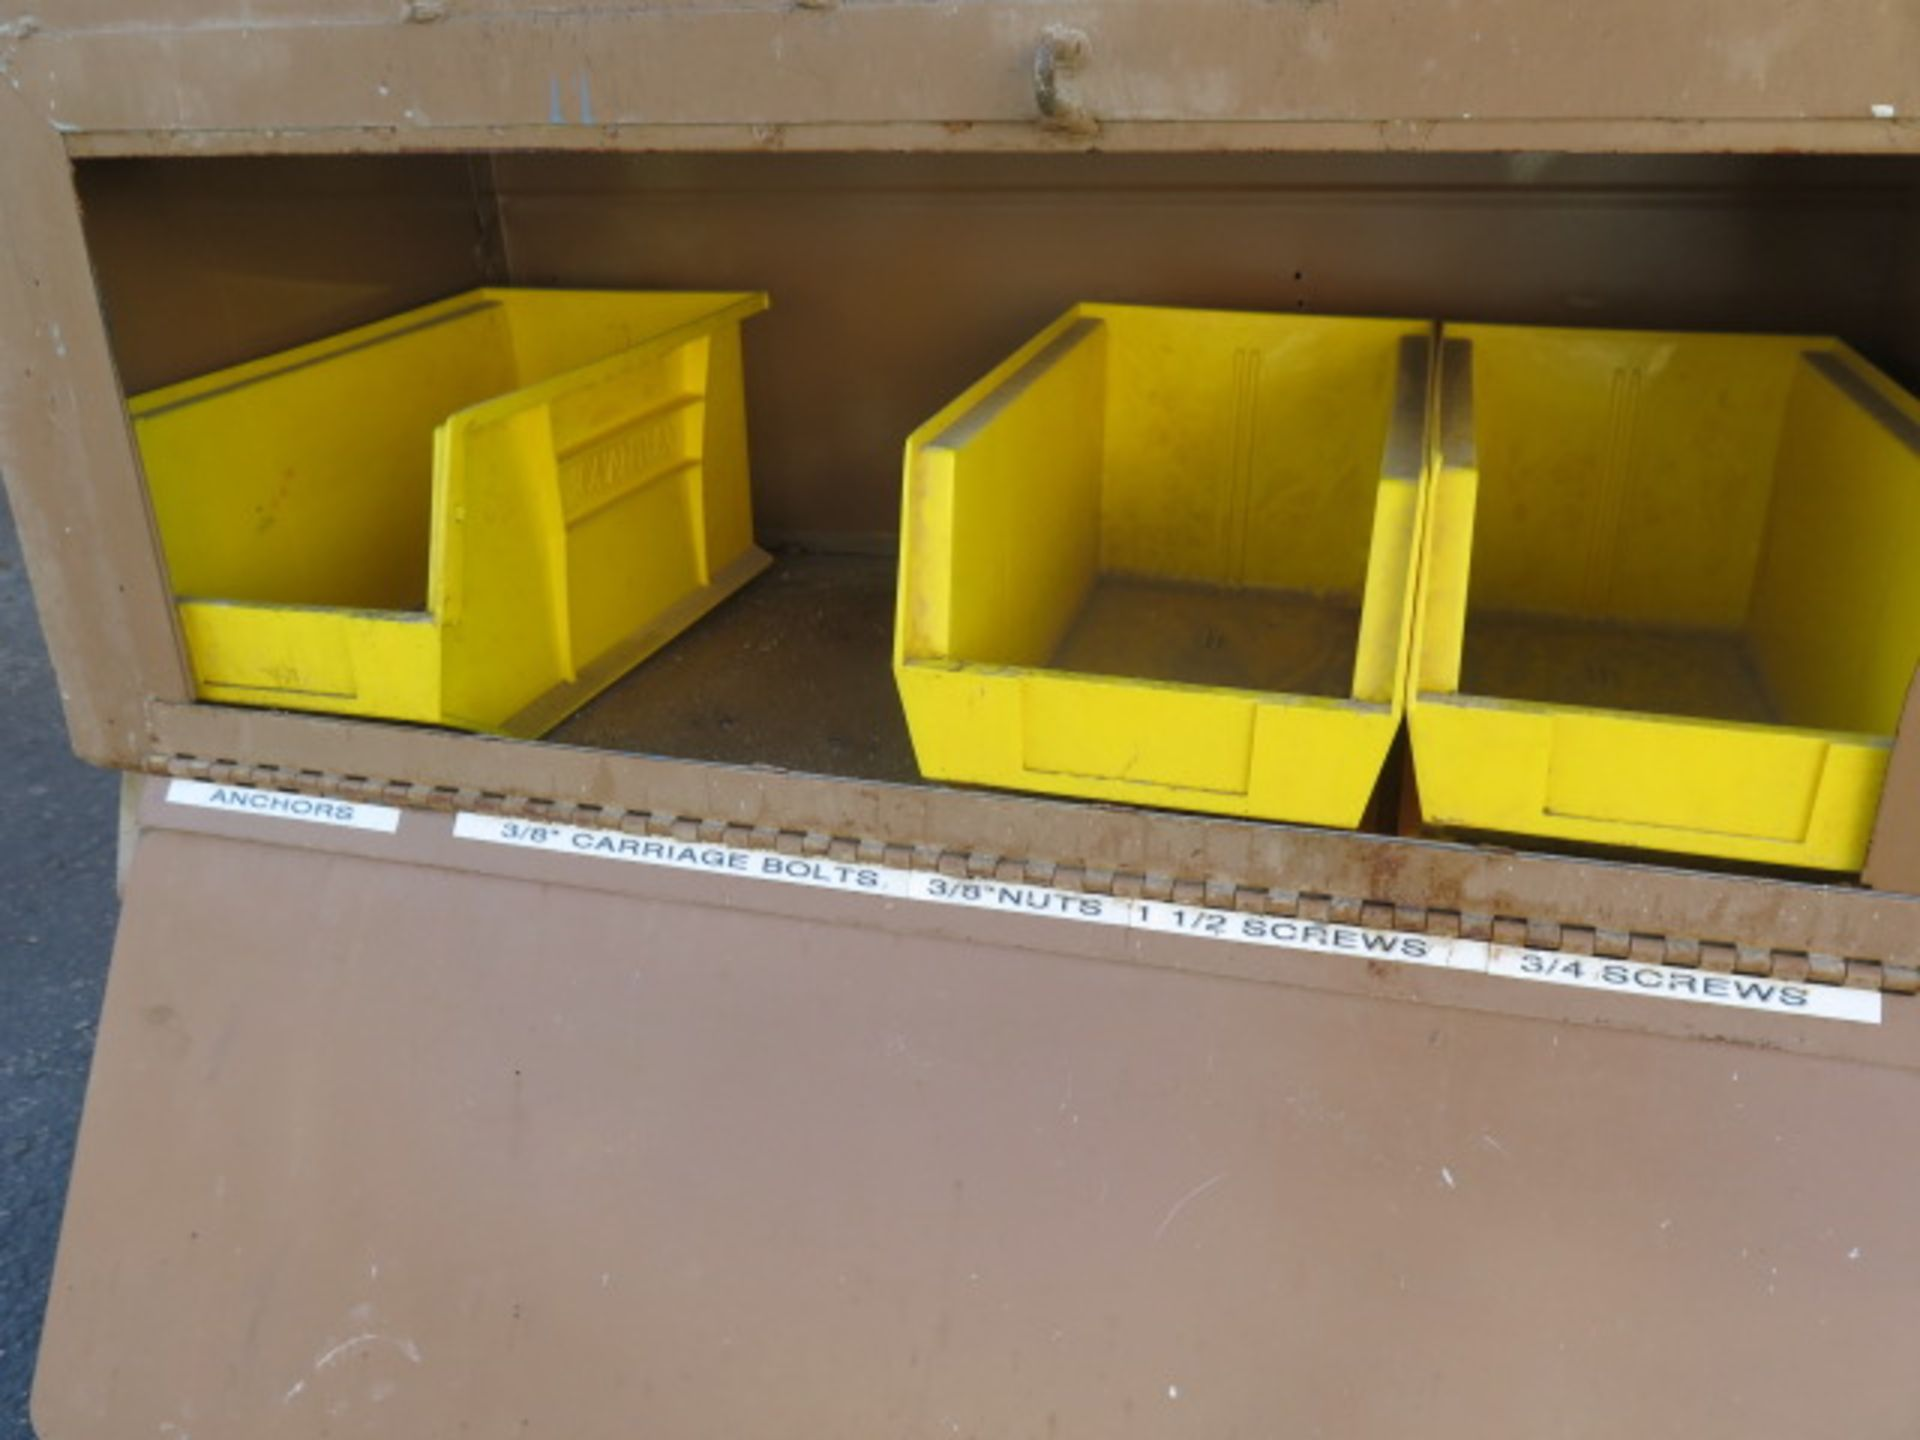 Knaack mdl. 89 Storagemaster Rolling Job Box (SOLD AS-IS - NO WARRANTY) - Image 10 of 12